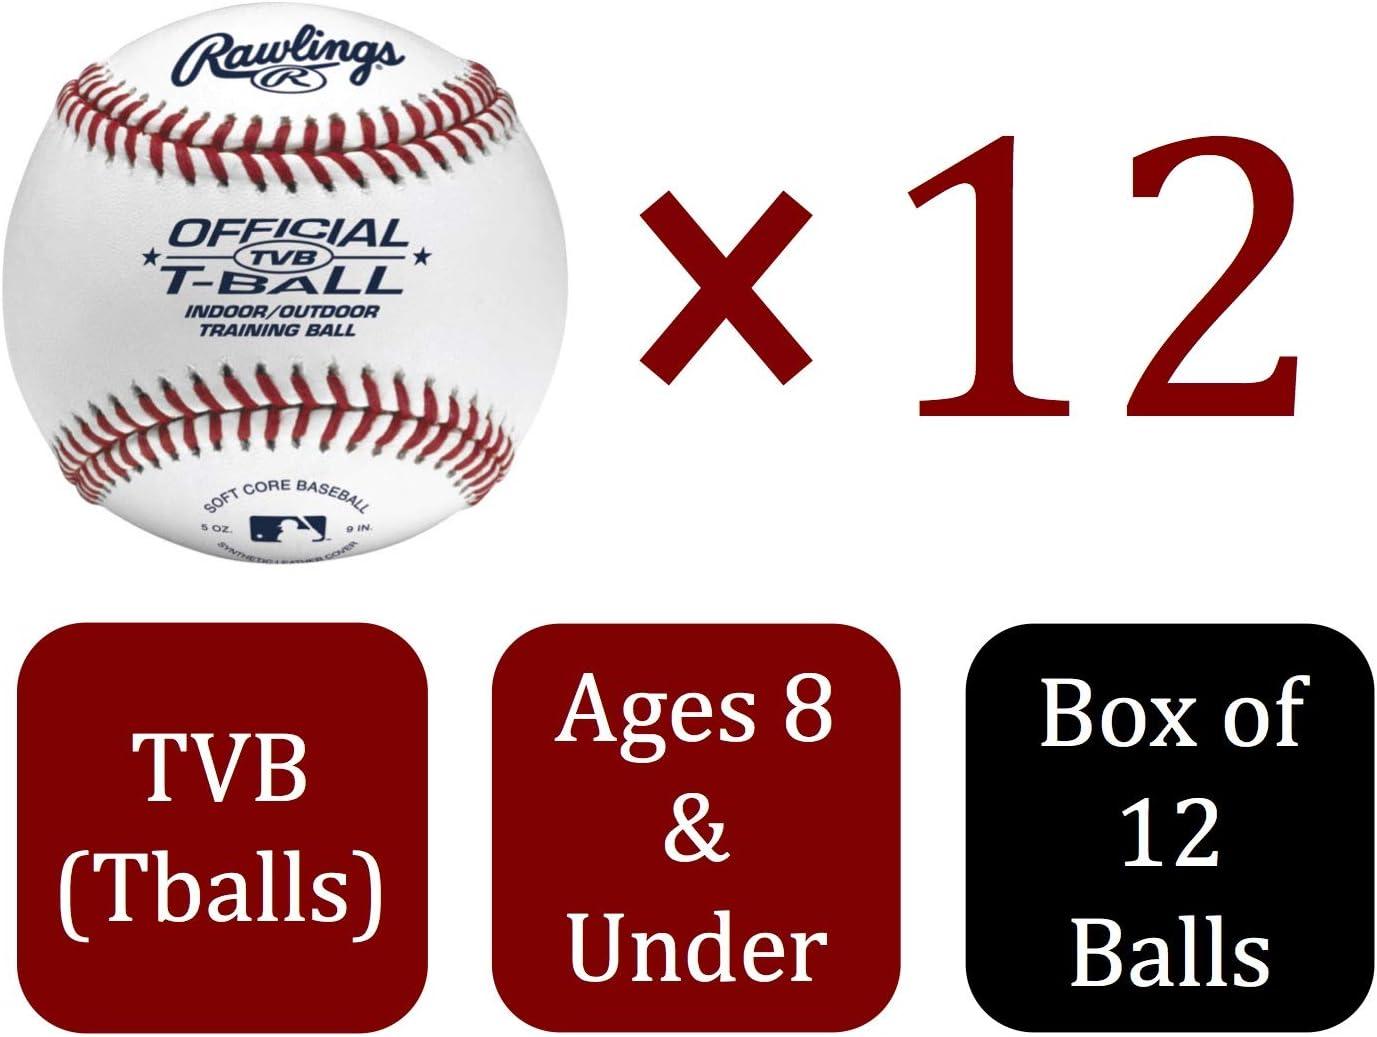 One Dozen Brand New Ages 6 /& Under TVB Rawlings Youth T-ball Baseballs